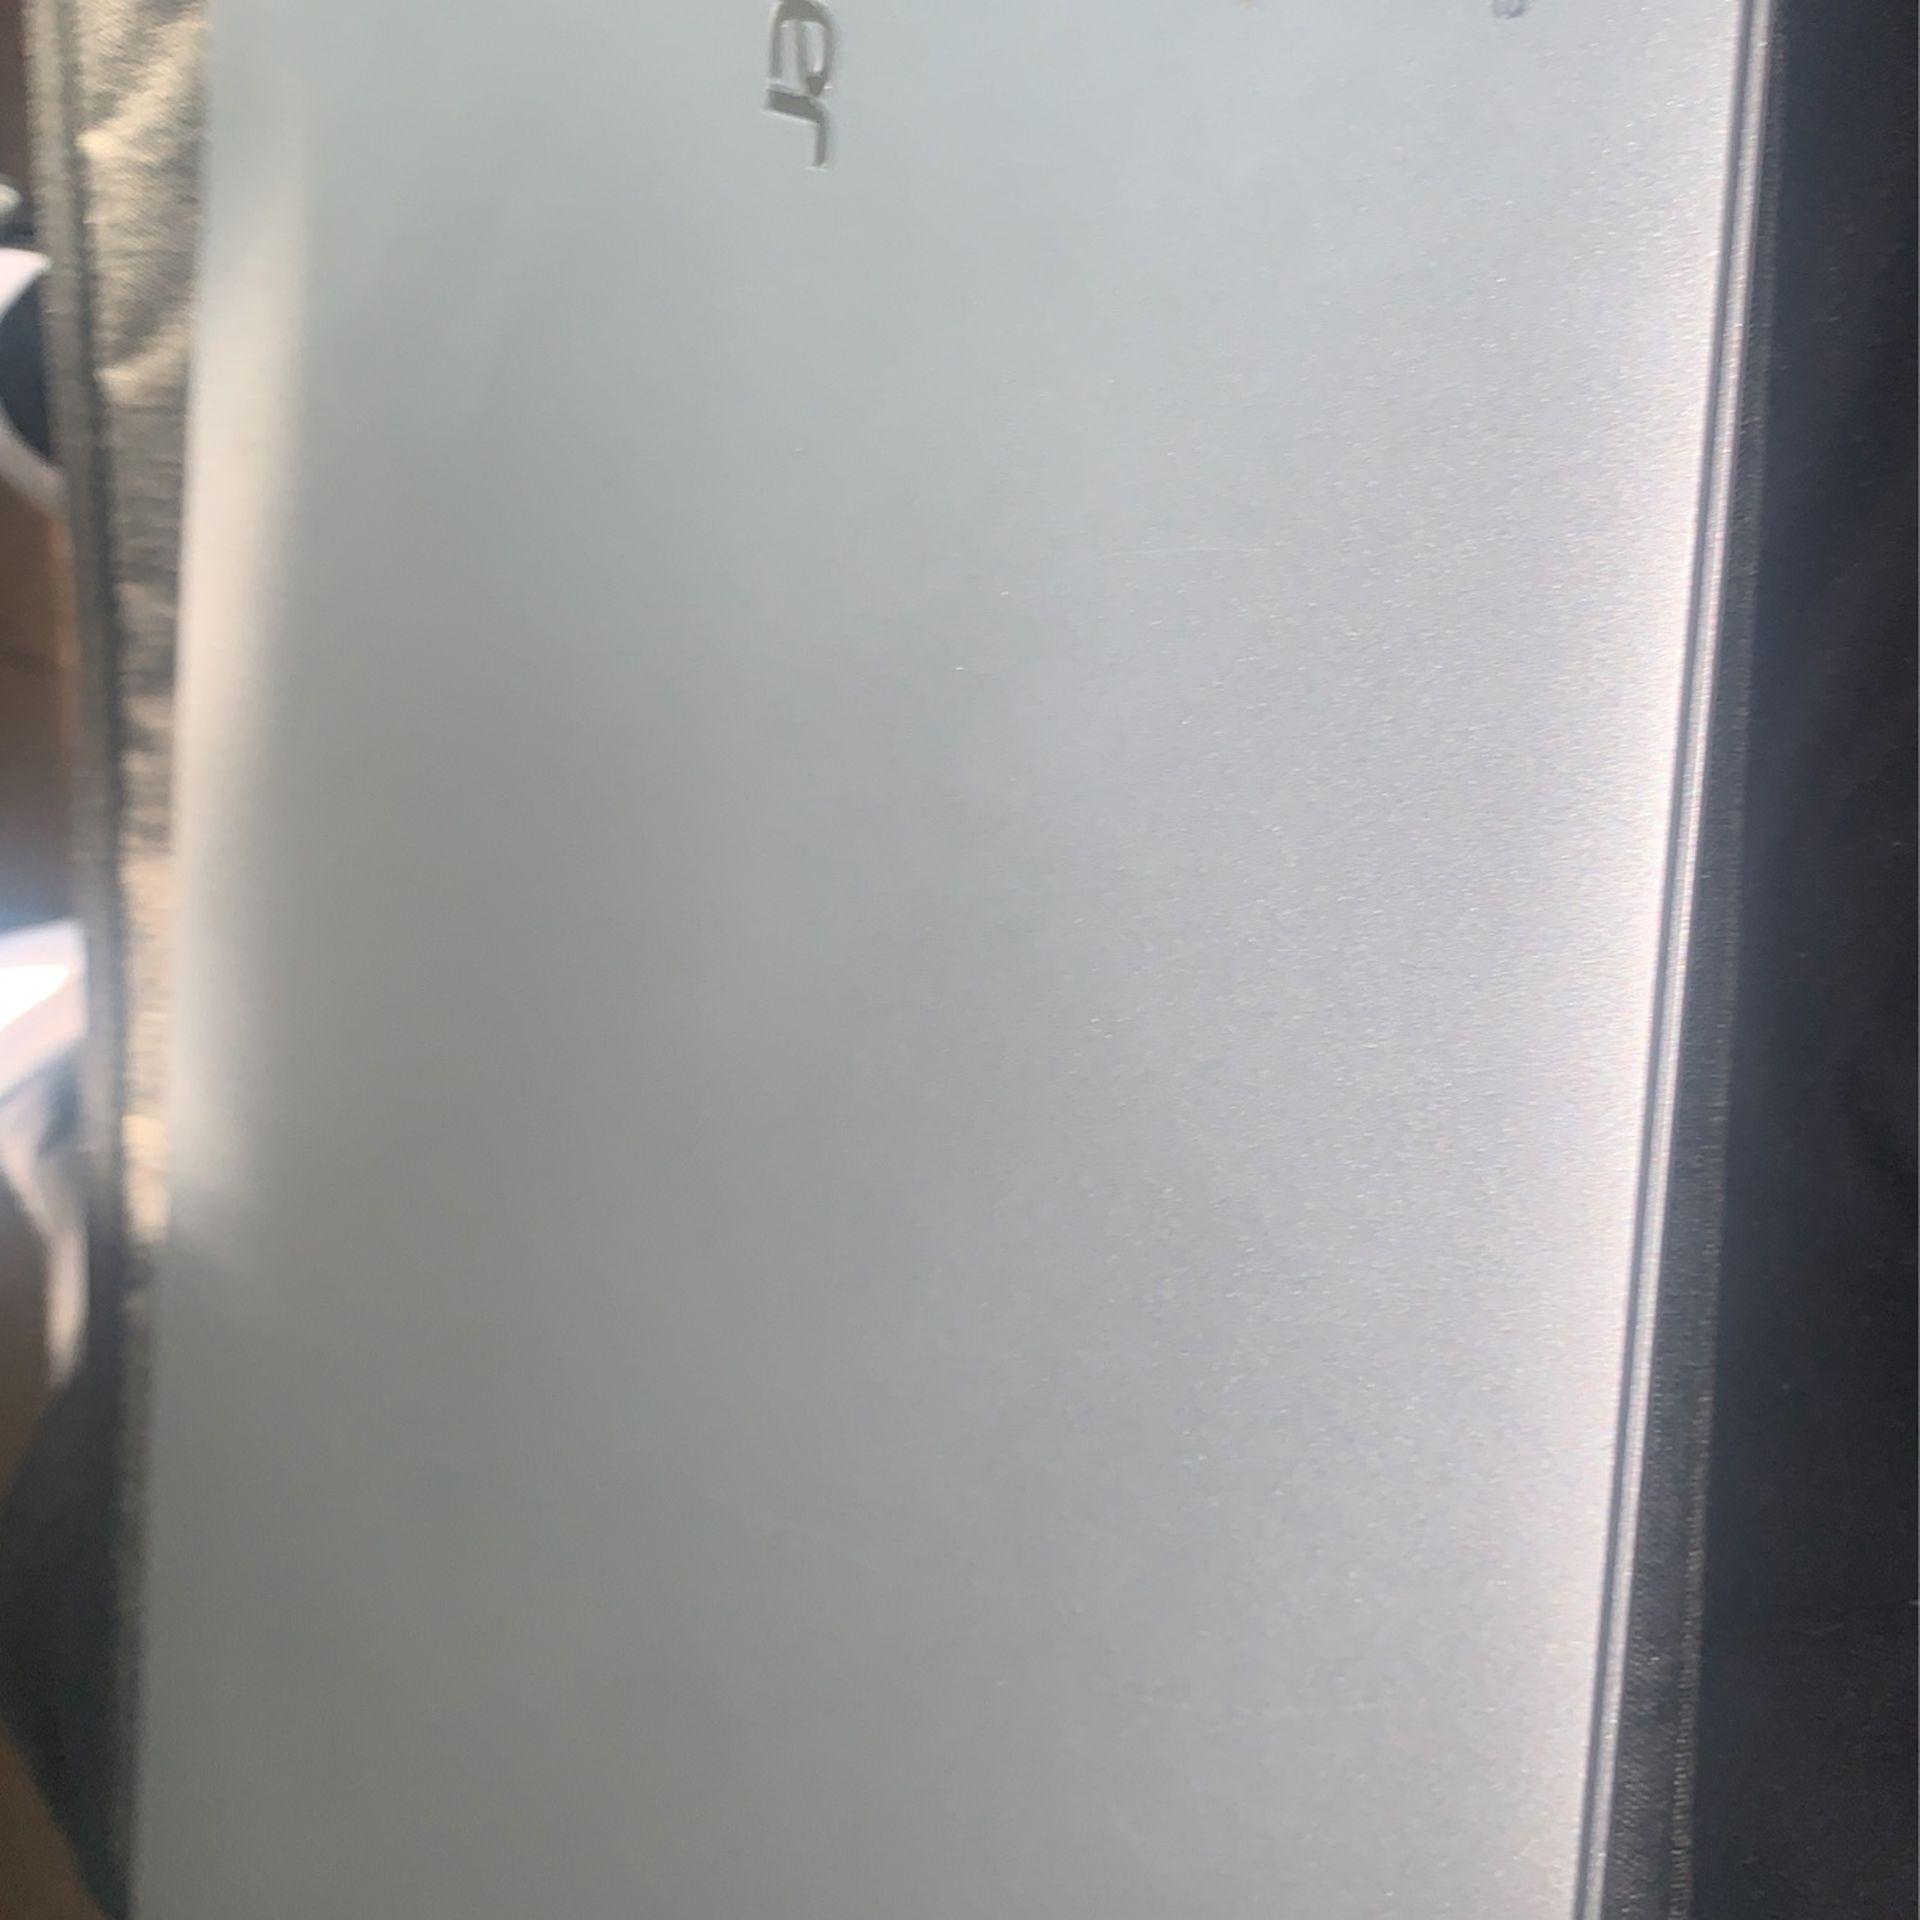 Acer Chromebook 15 In